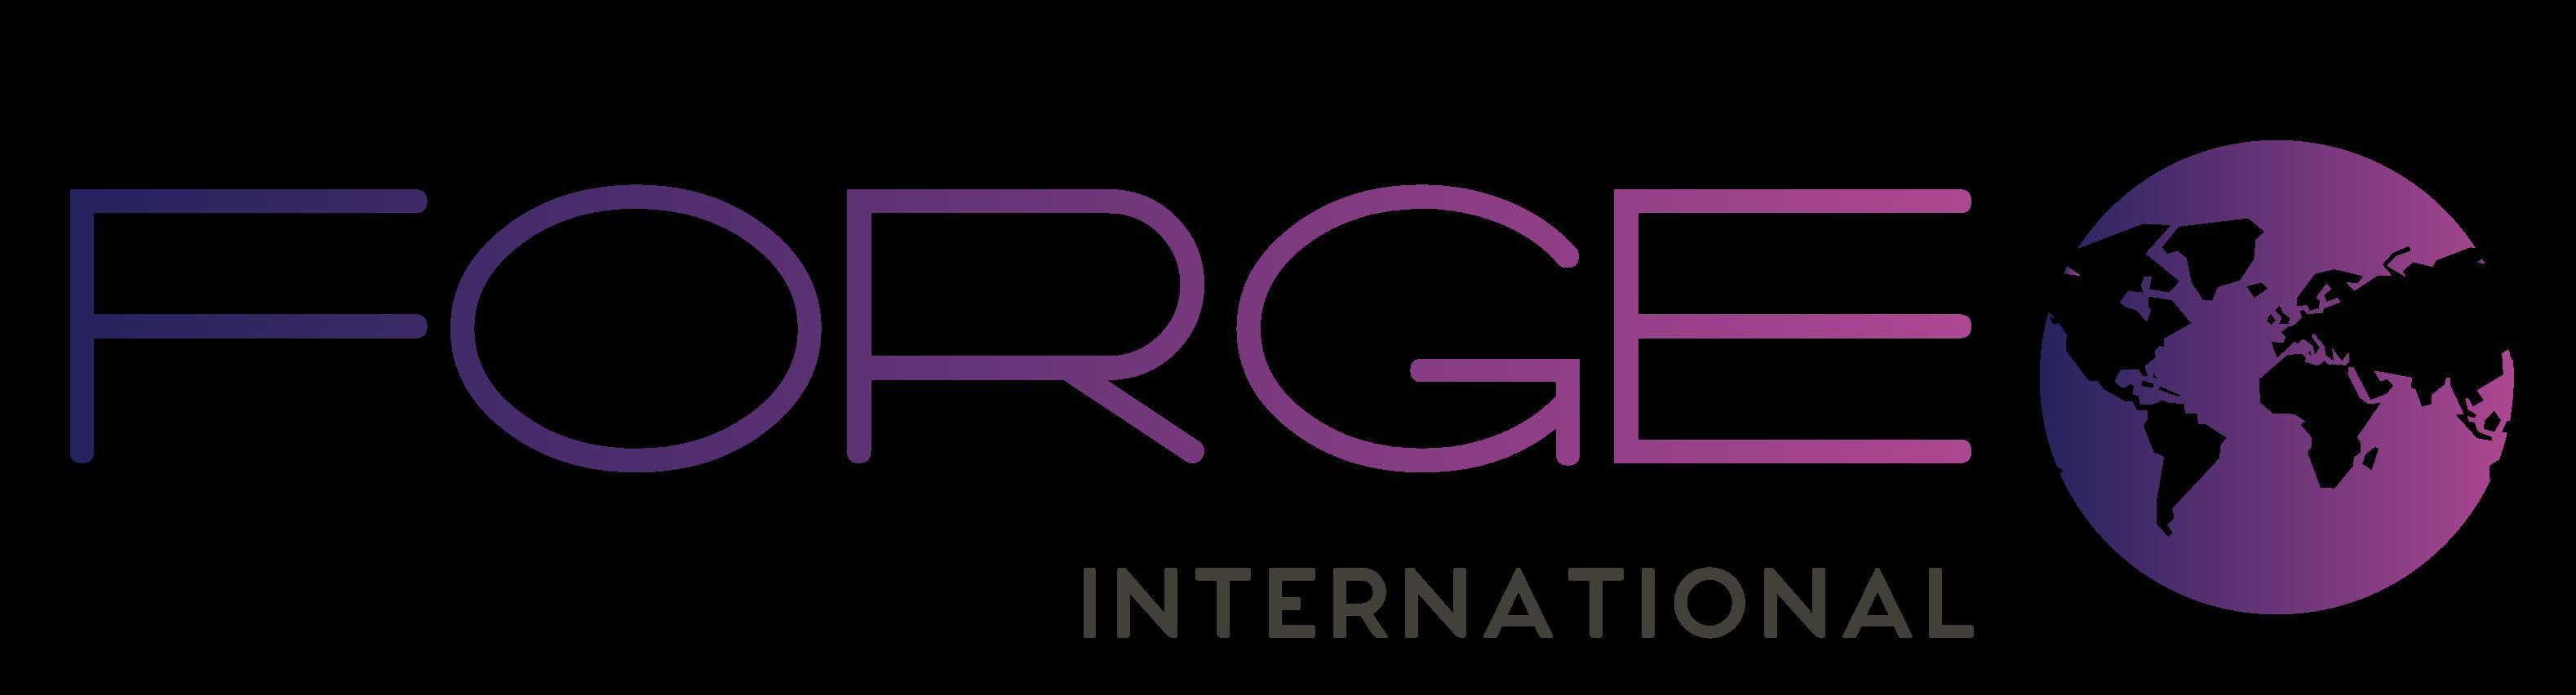 Forge International